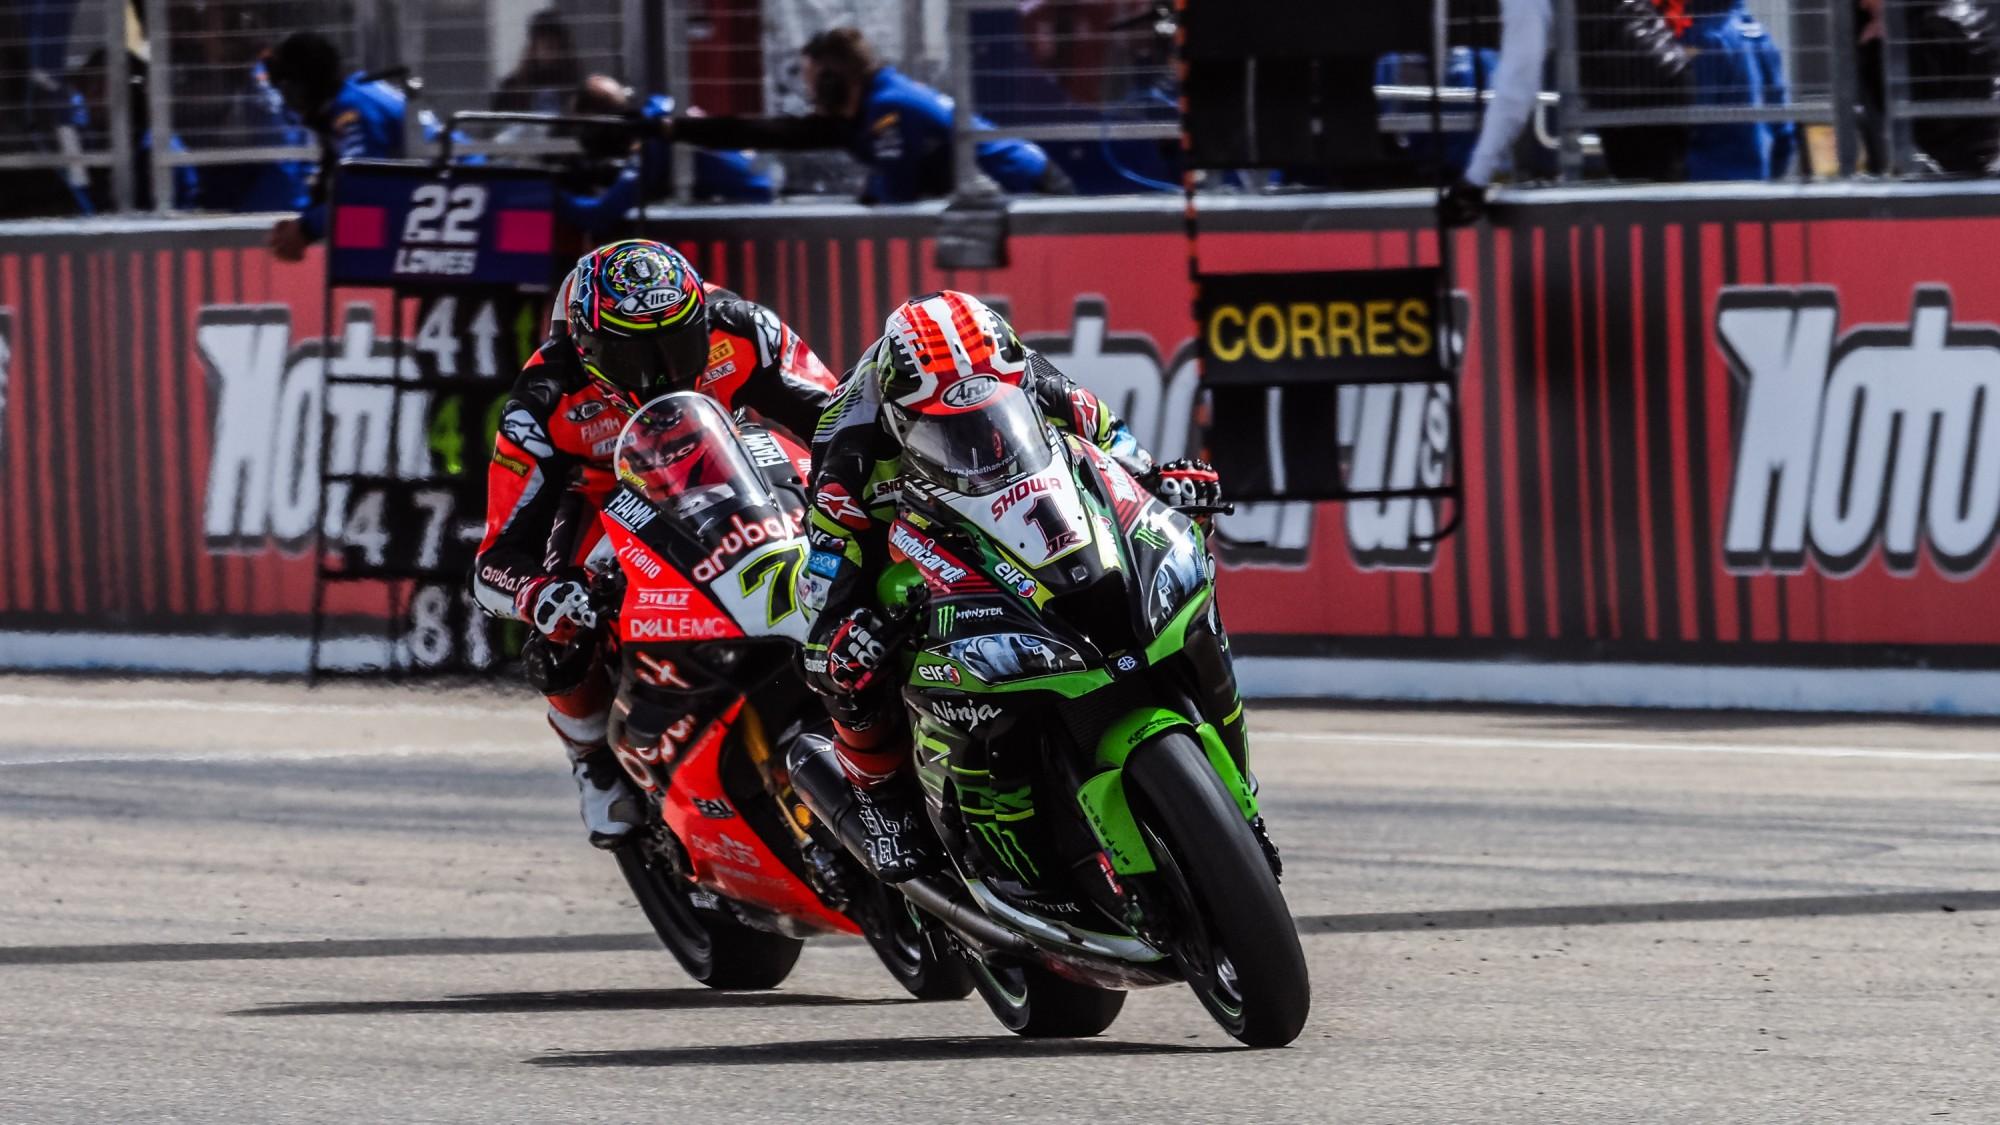 WSBK 2019 Motocard Aragon Round_2